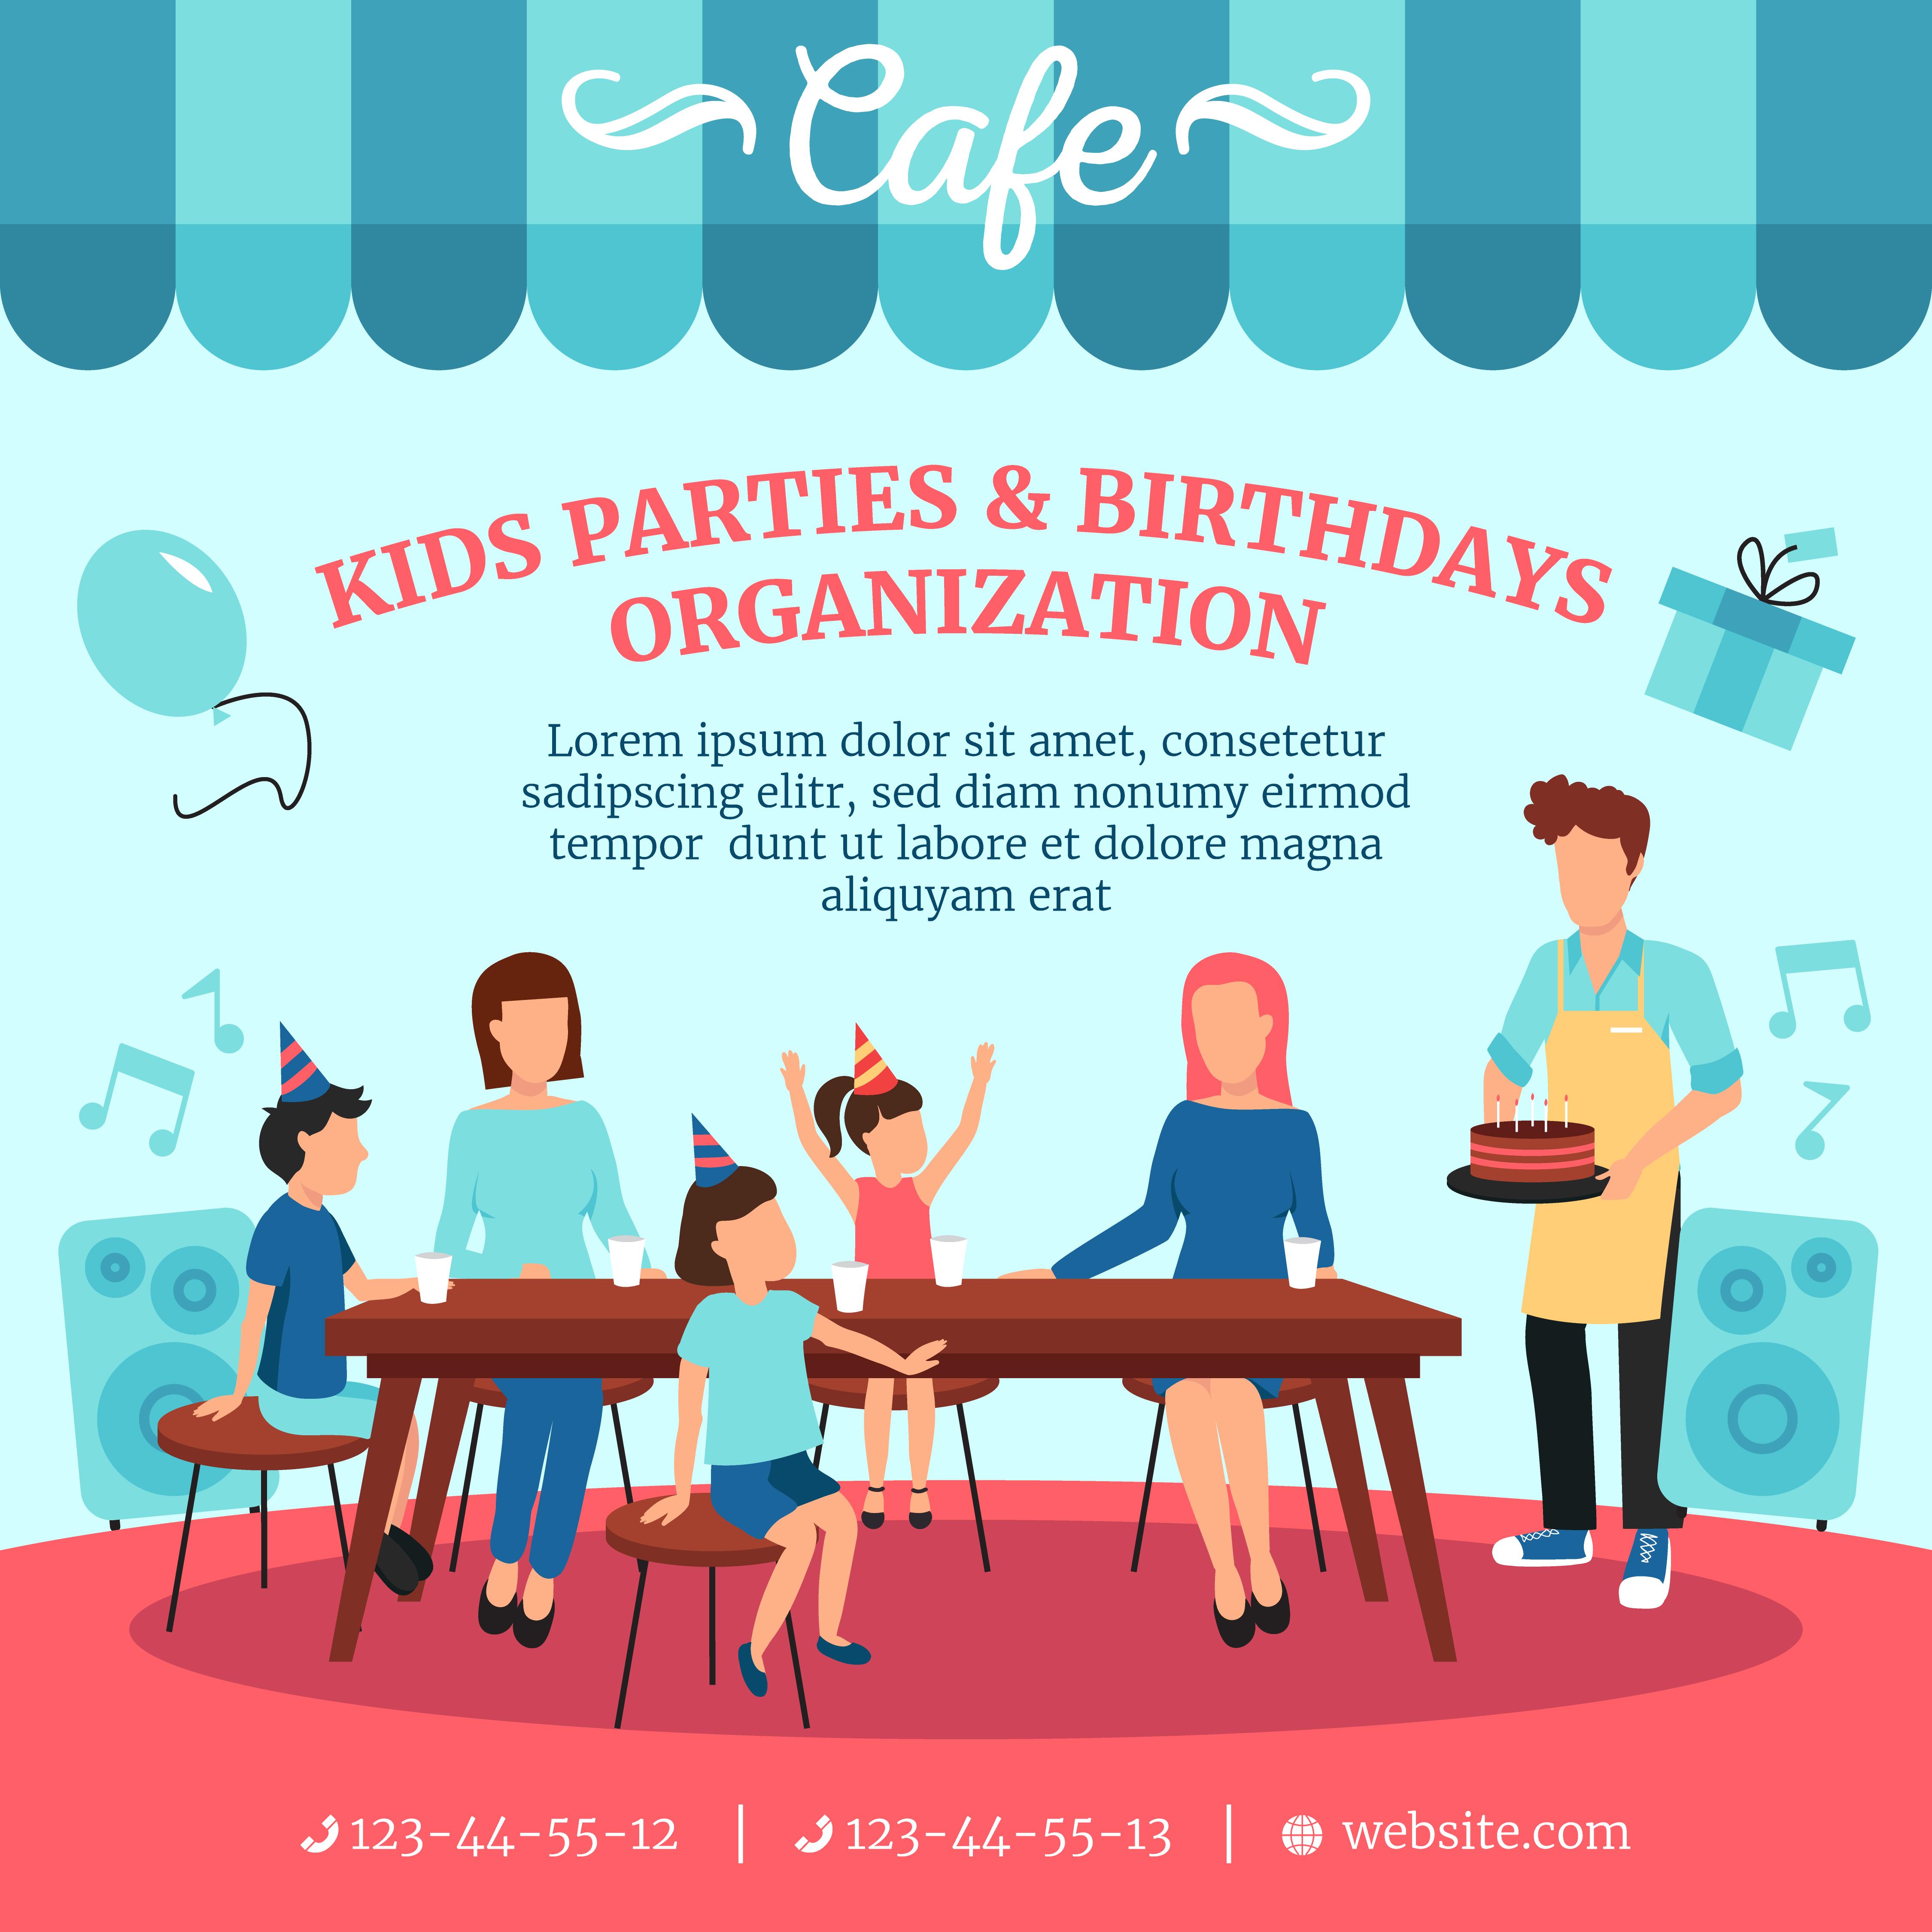 Cafe Restaurant Service Flat Poster Advertisement 484210